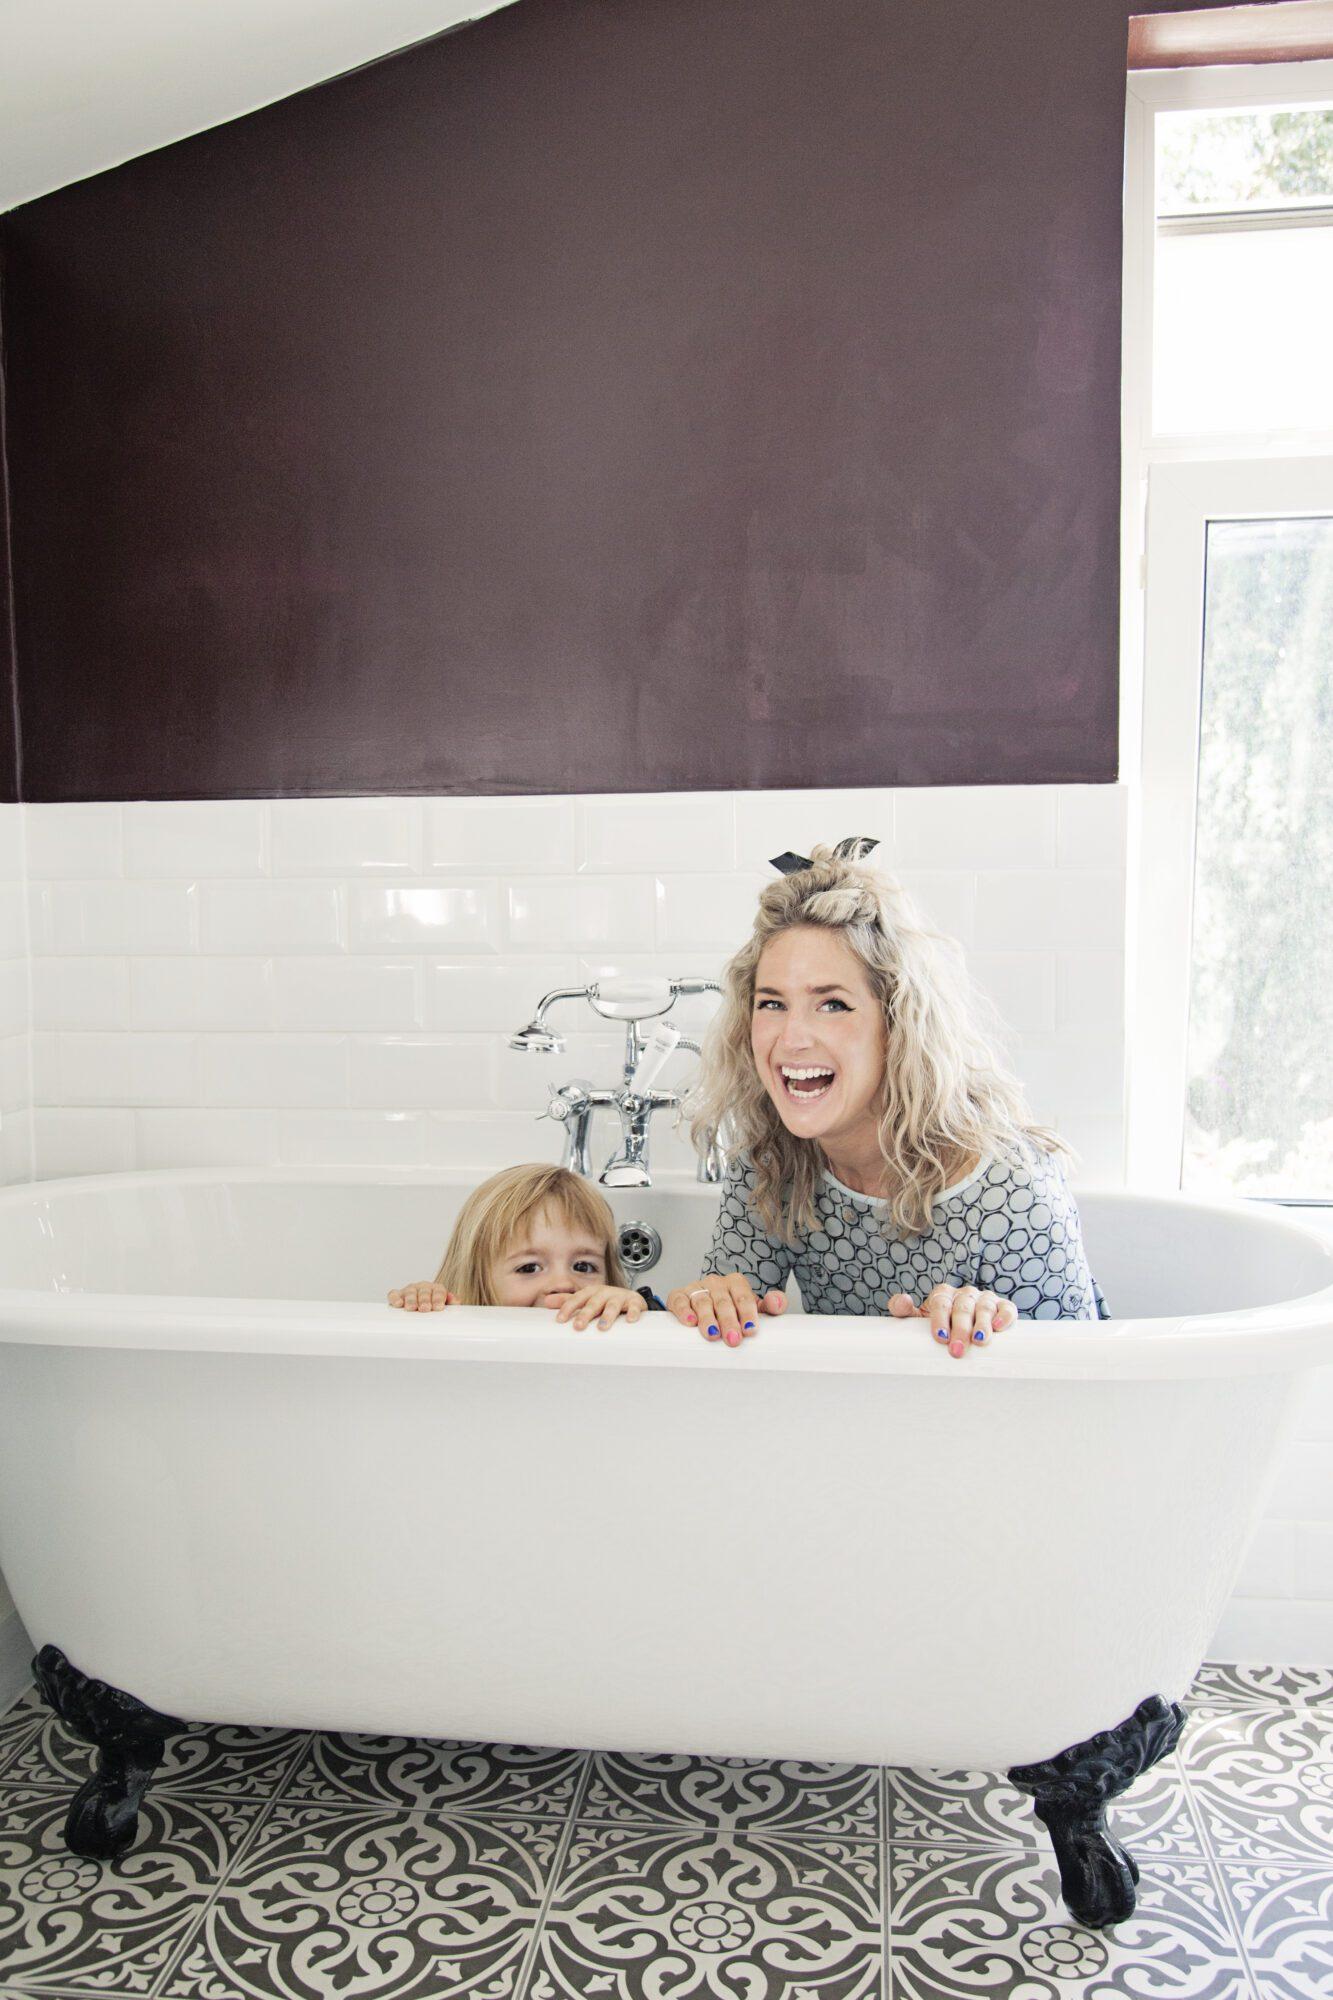 Anna Whitehouse, aka Mother Pukka and Matt Farquarson, aka Papa Pukka, with daughter Mae at their home in Leyton.